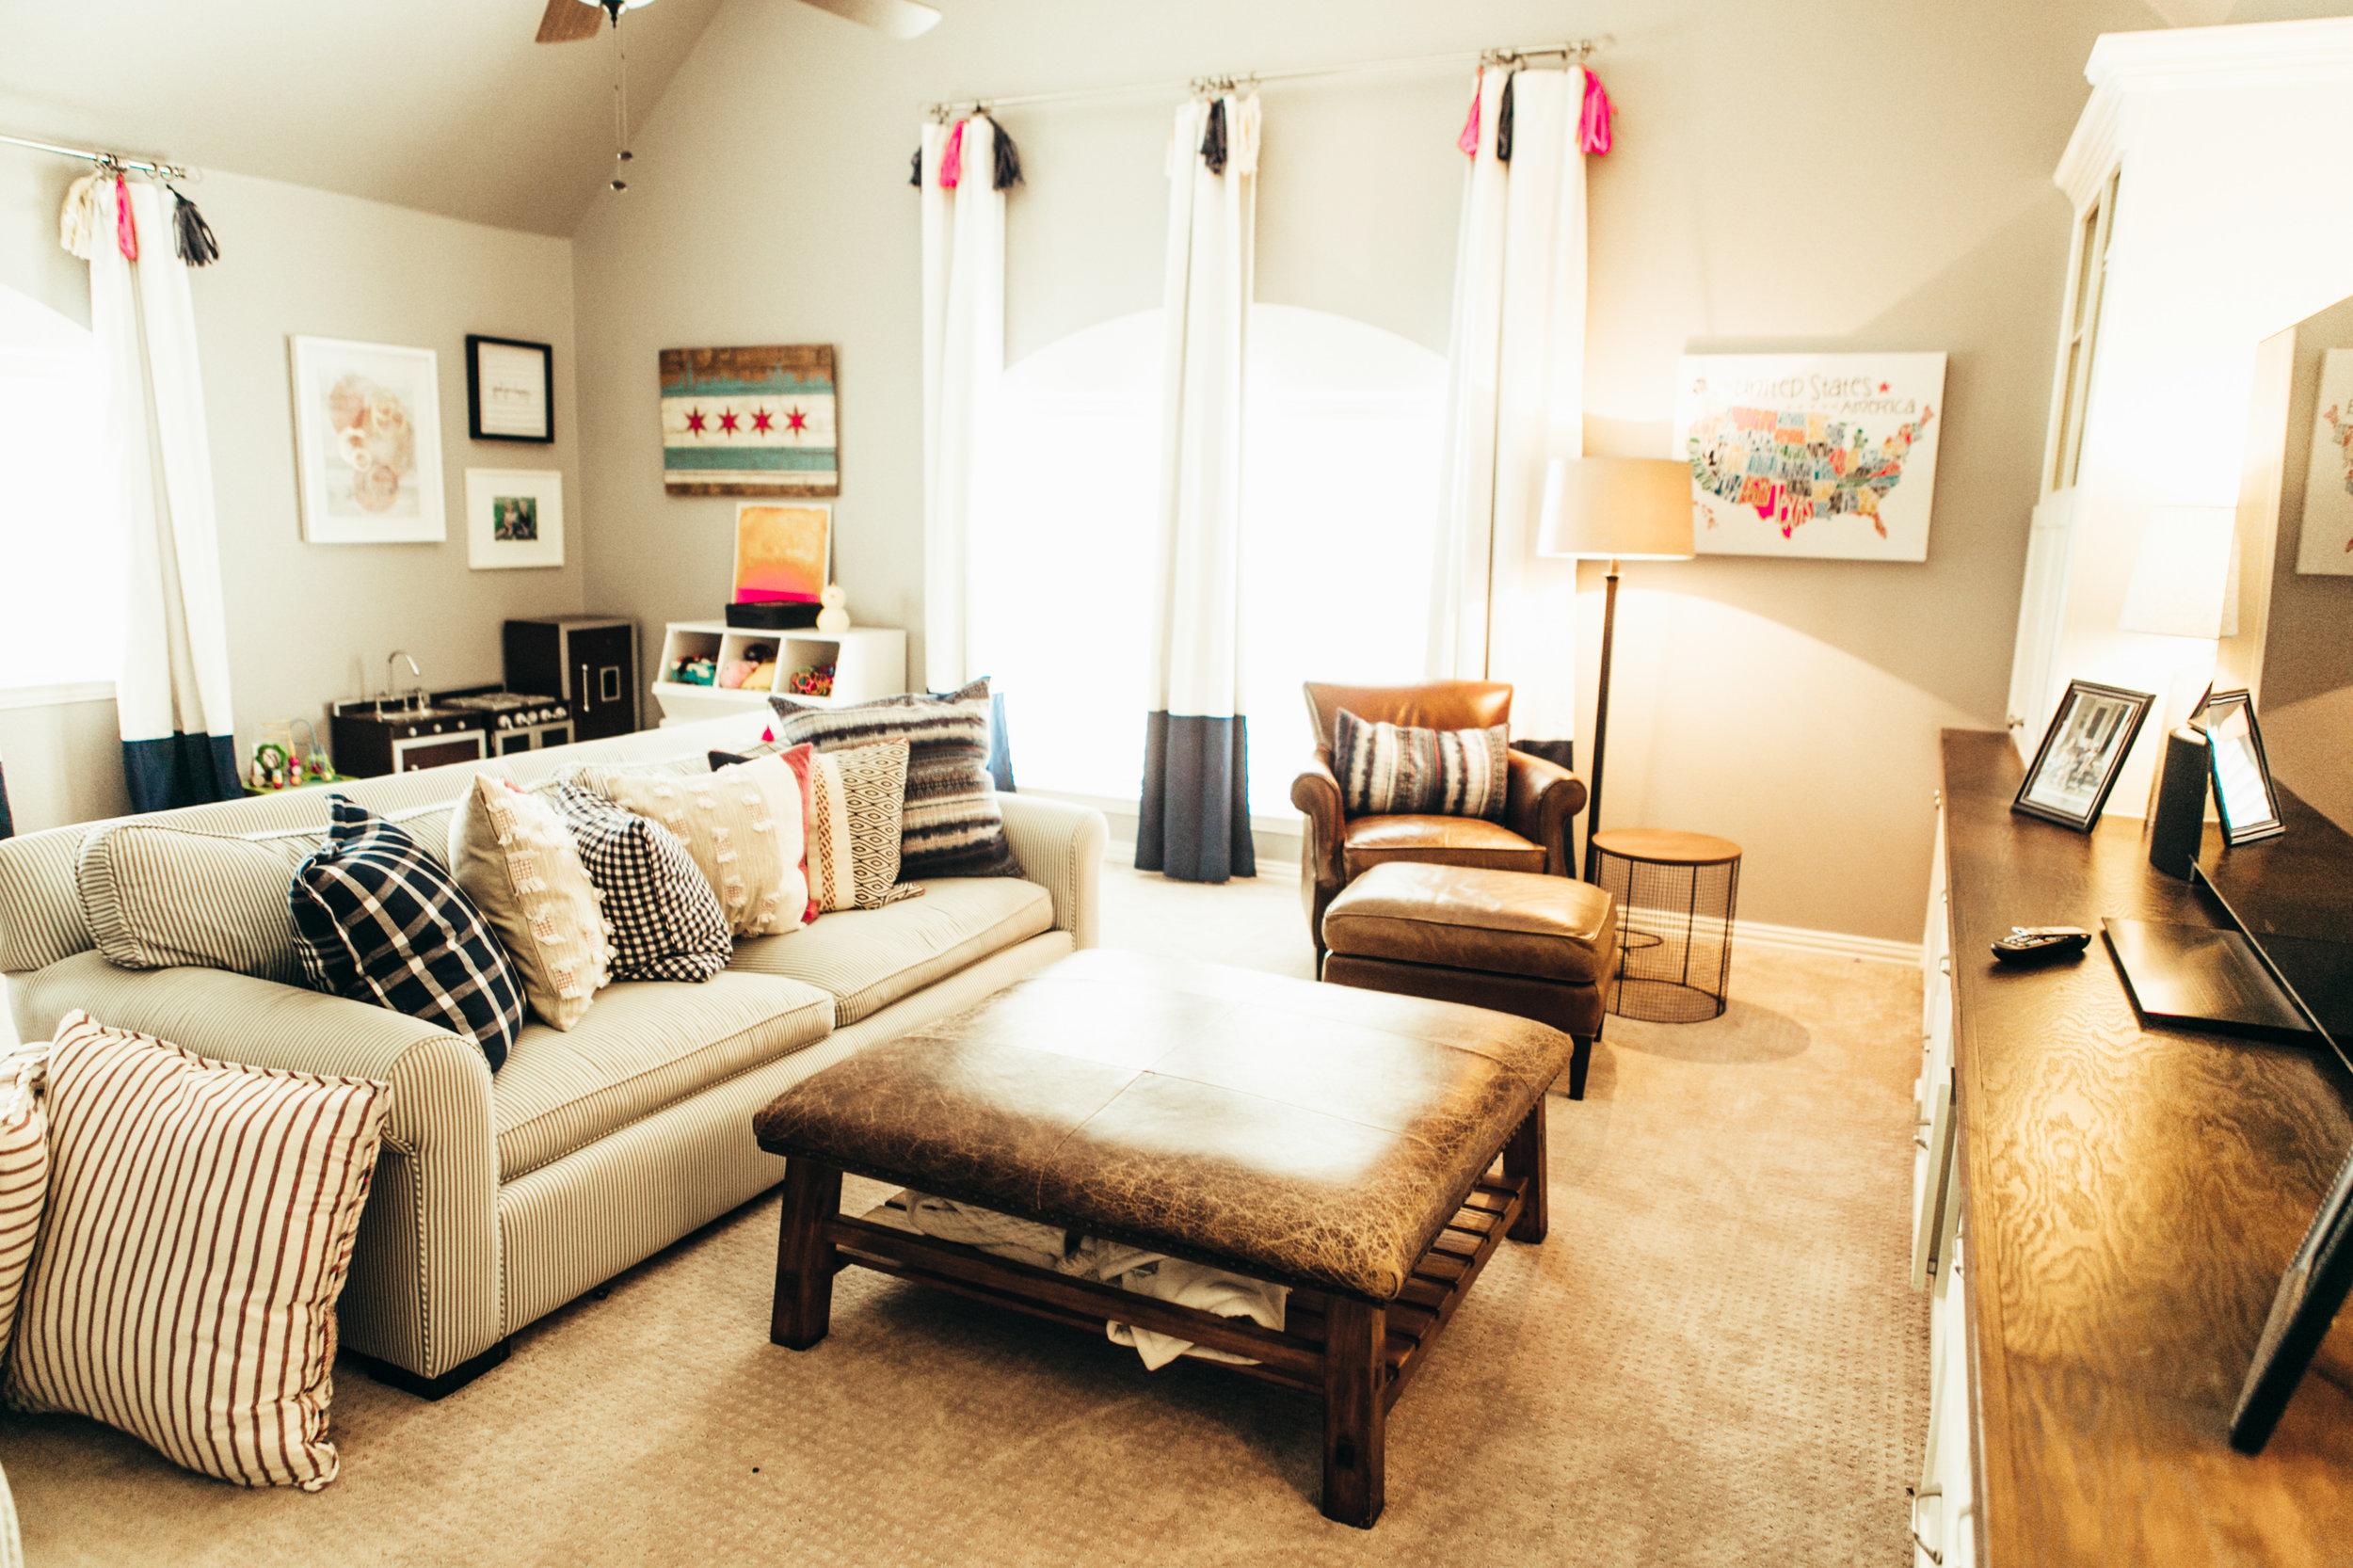 Playroom Interior Design 2.jpg